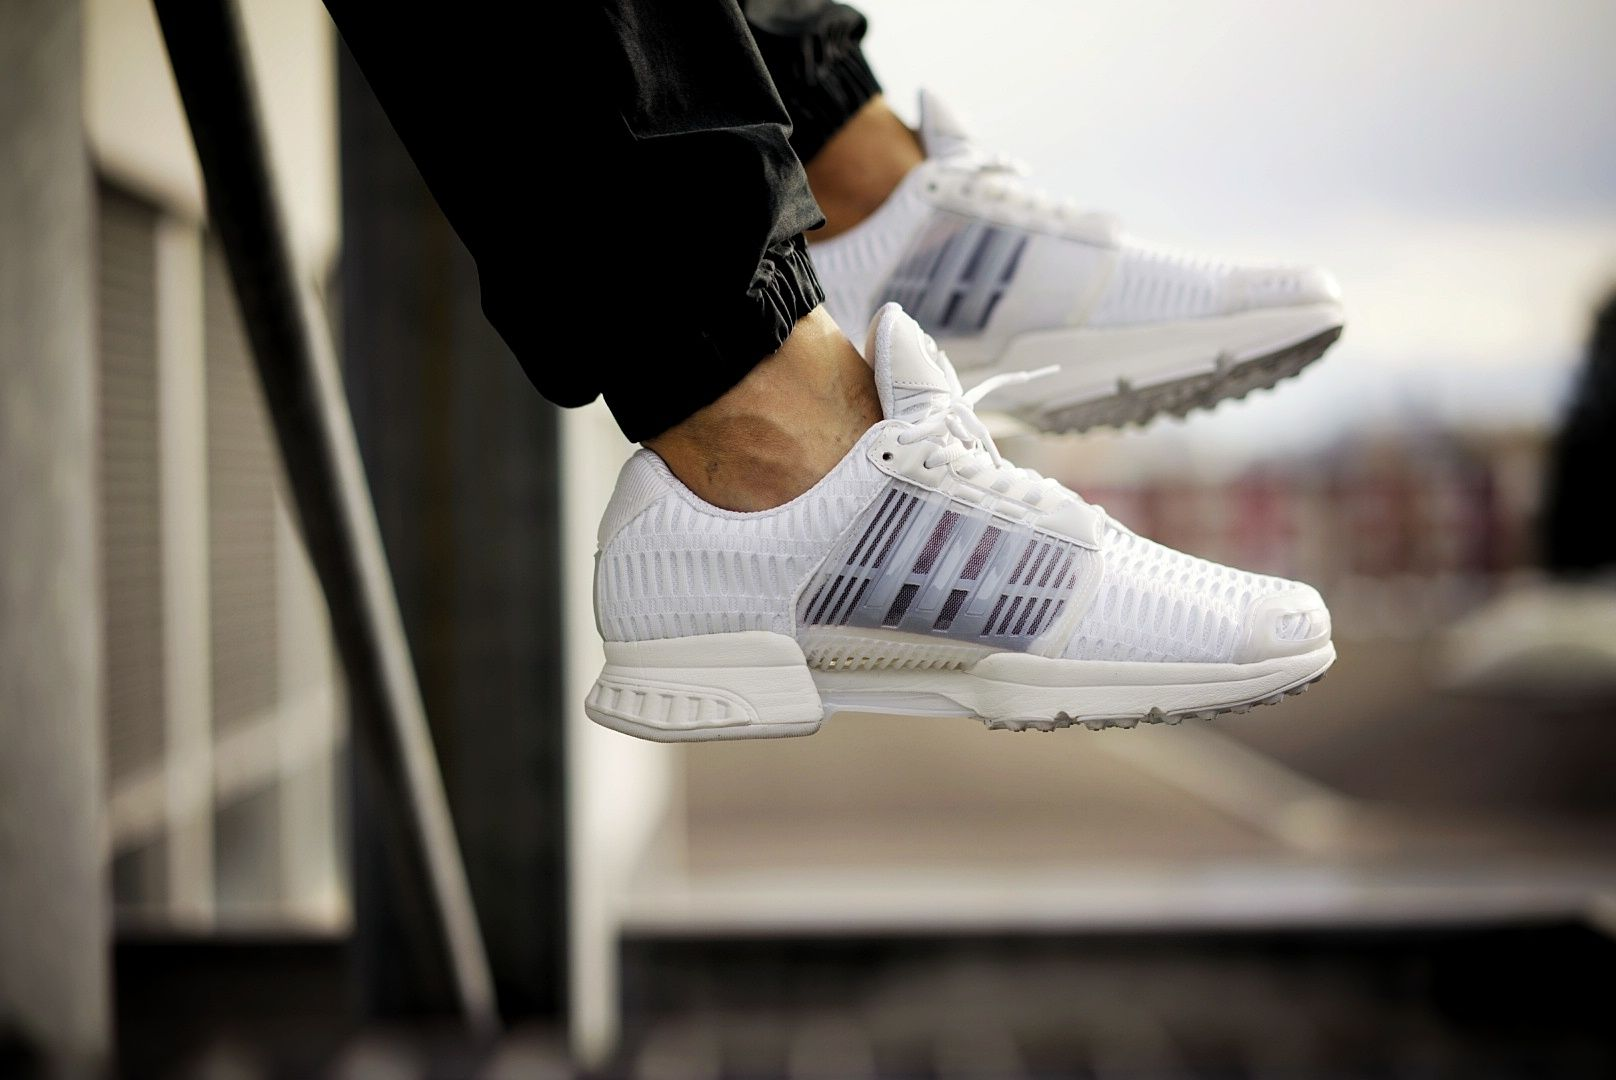 Adidas Climacool 1 now in Monochrome - EU Kicks: Sneaker Magazine ...